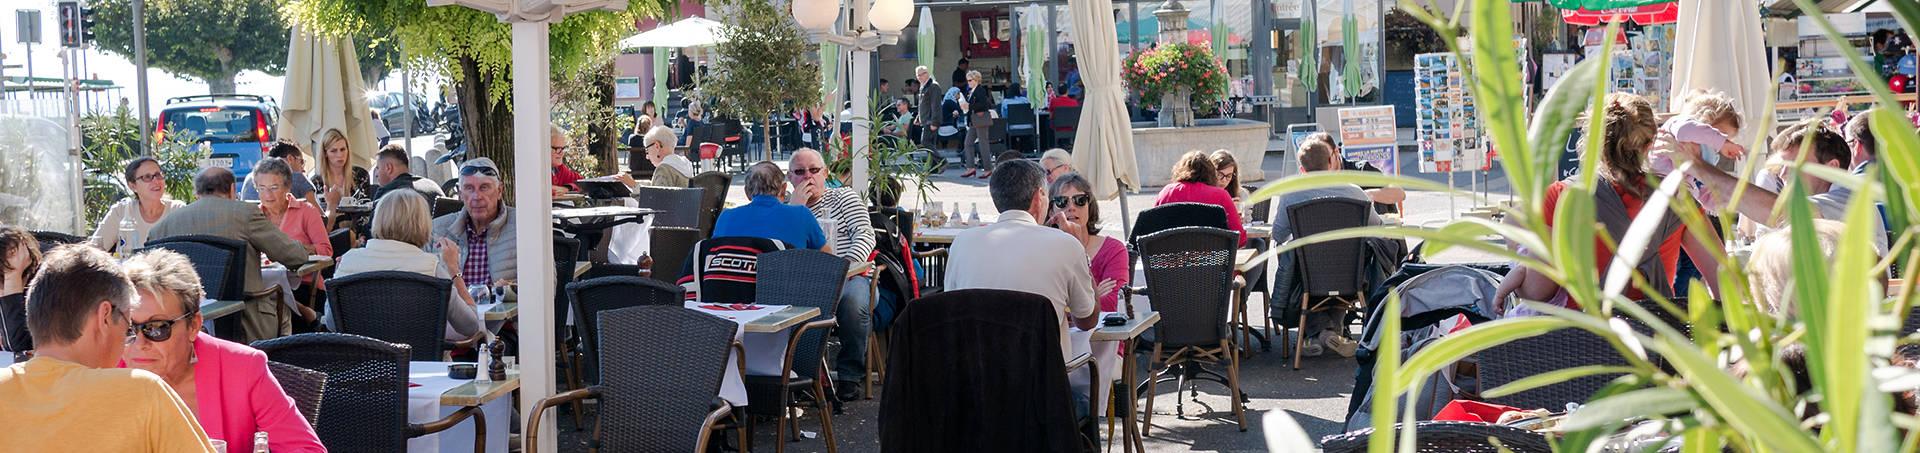 terrasse-restaurant-leman-nyon